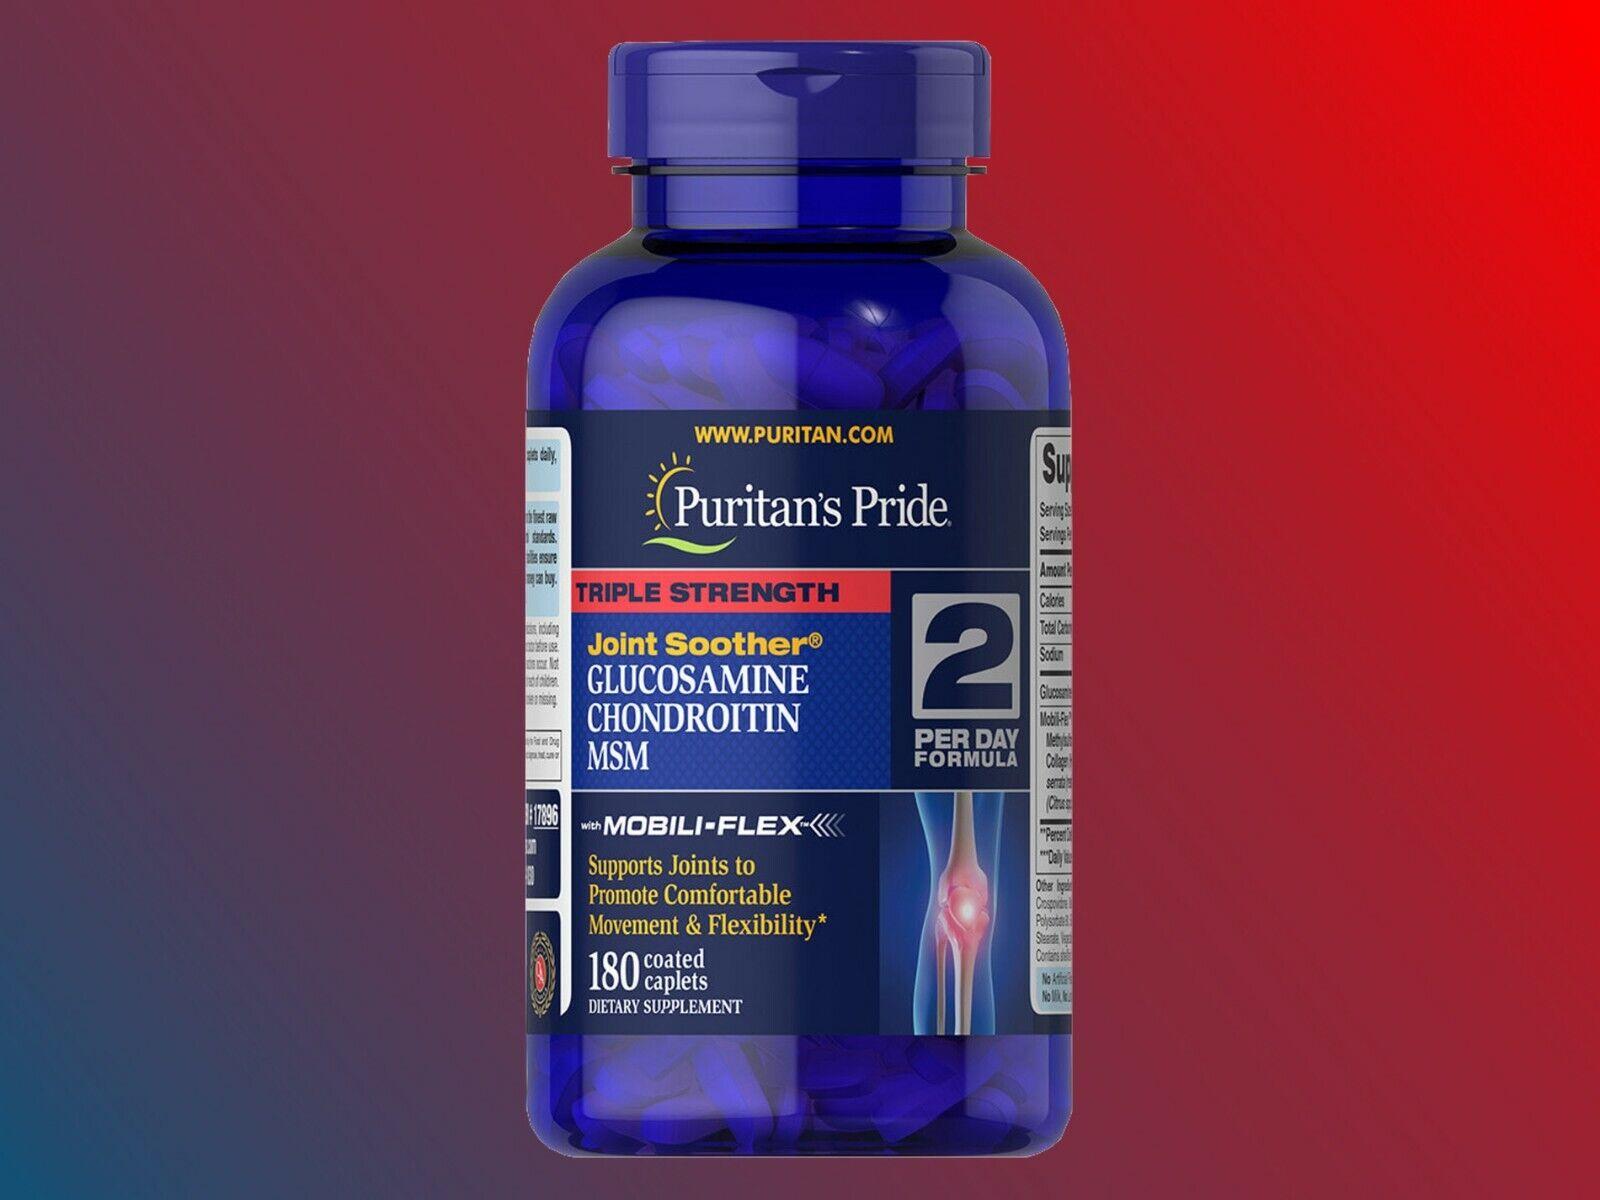 Puritan's Pride Triple Strength Glucosamine Chondroitin & MS